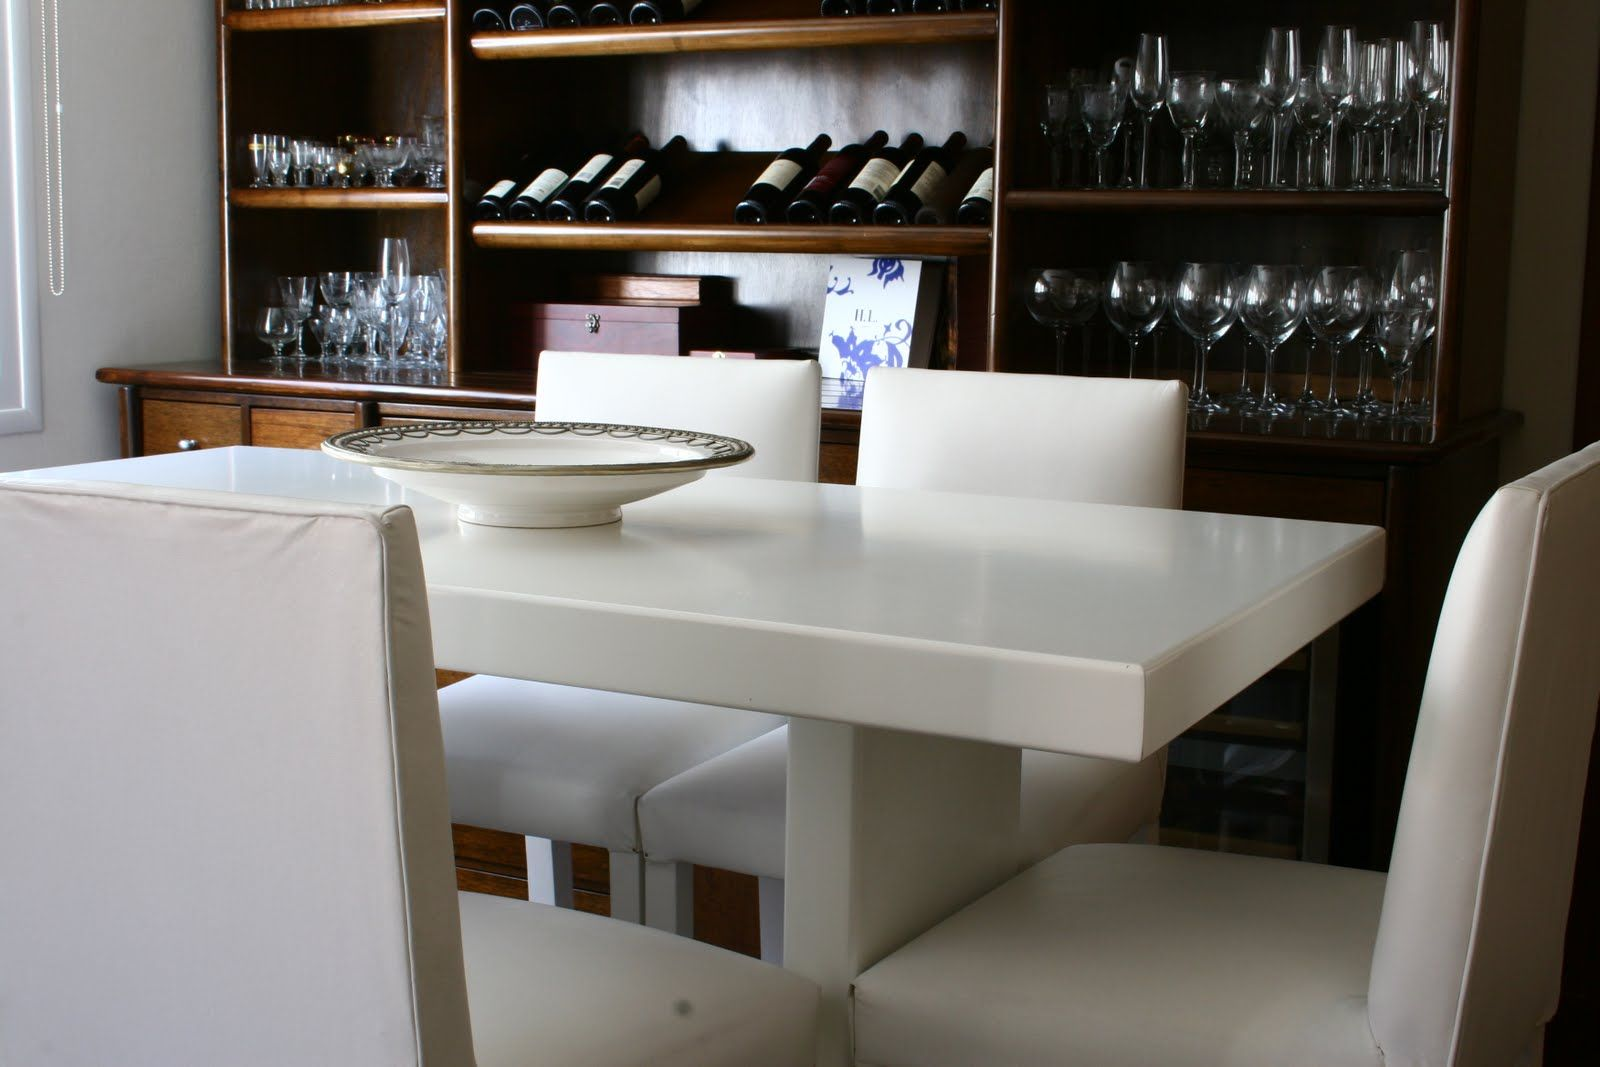 Mesa alta laqueada blanca con mueble bar en madera de lenga el comedor comedores living - Mesa alta comedor ...